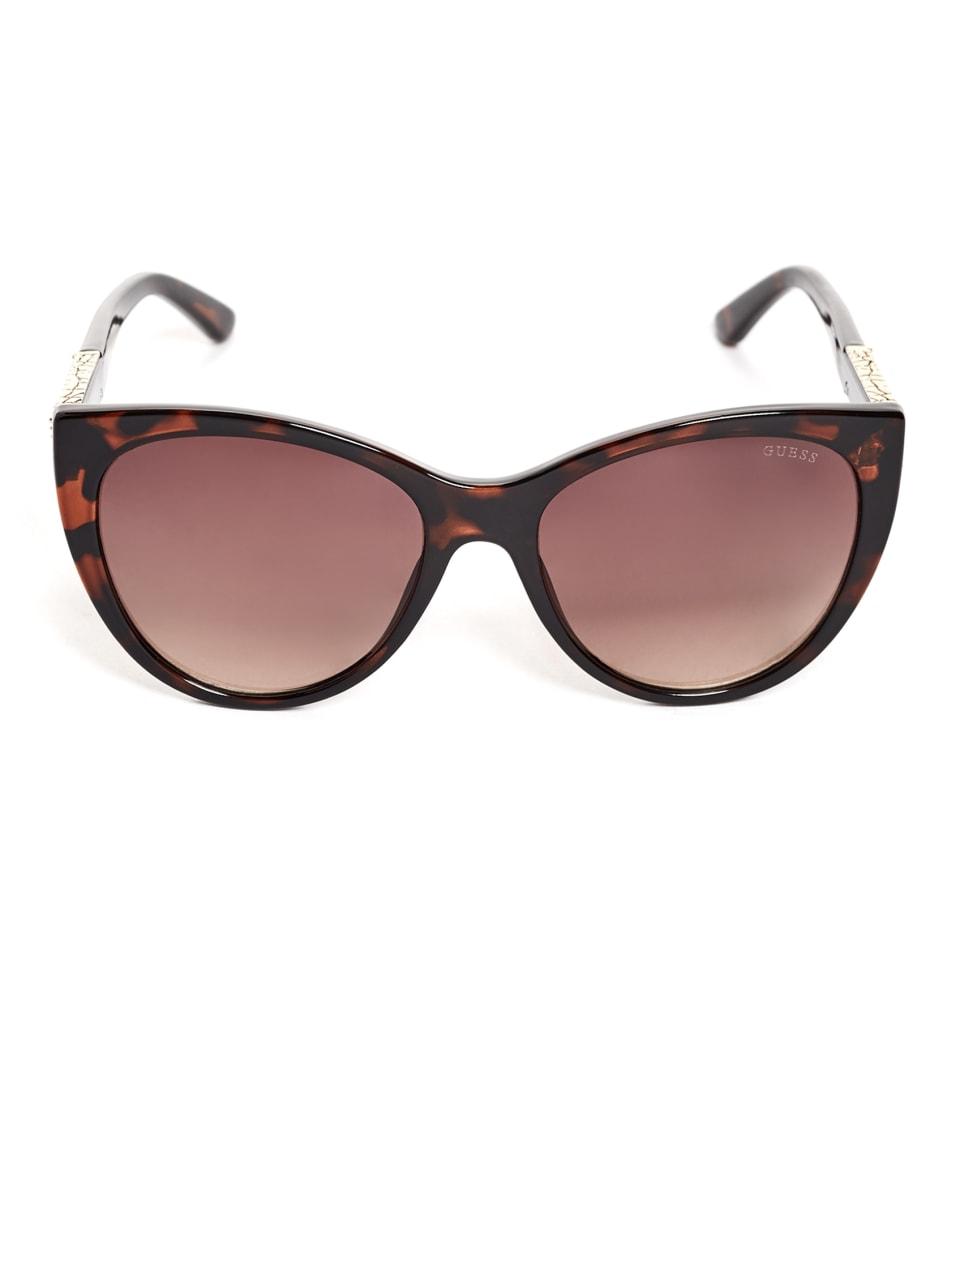 GUESS-Factory-Women-039-s-Plastic-Cat-Eye-Sunglasses thumbnail 9